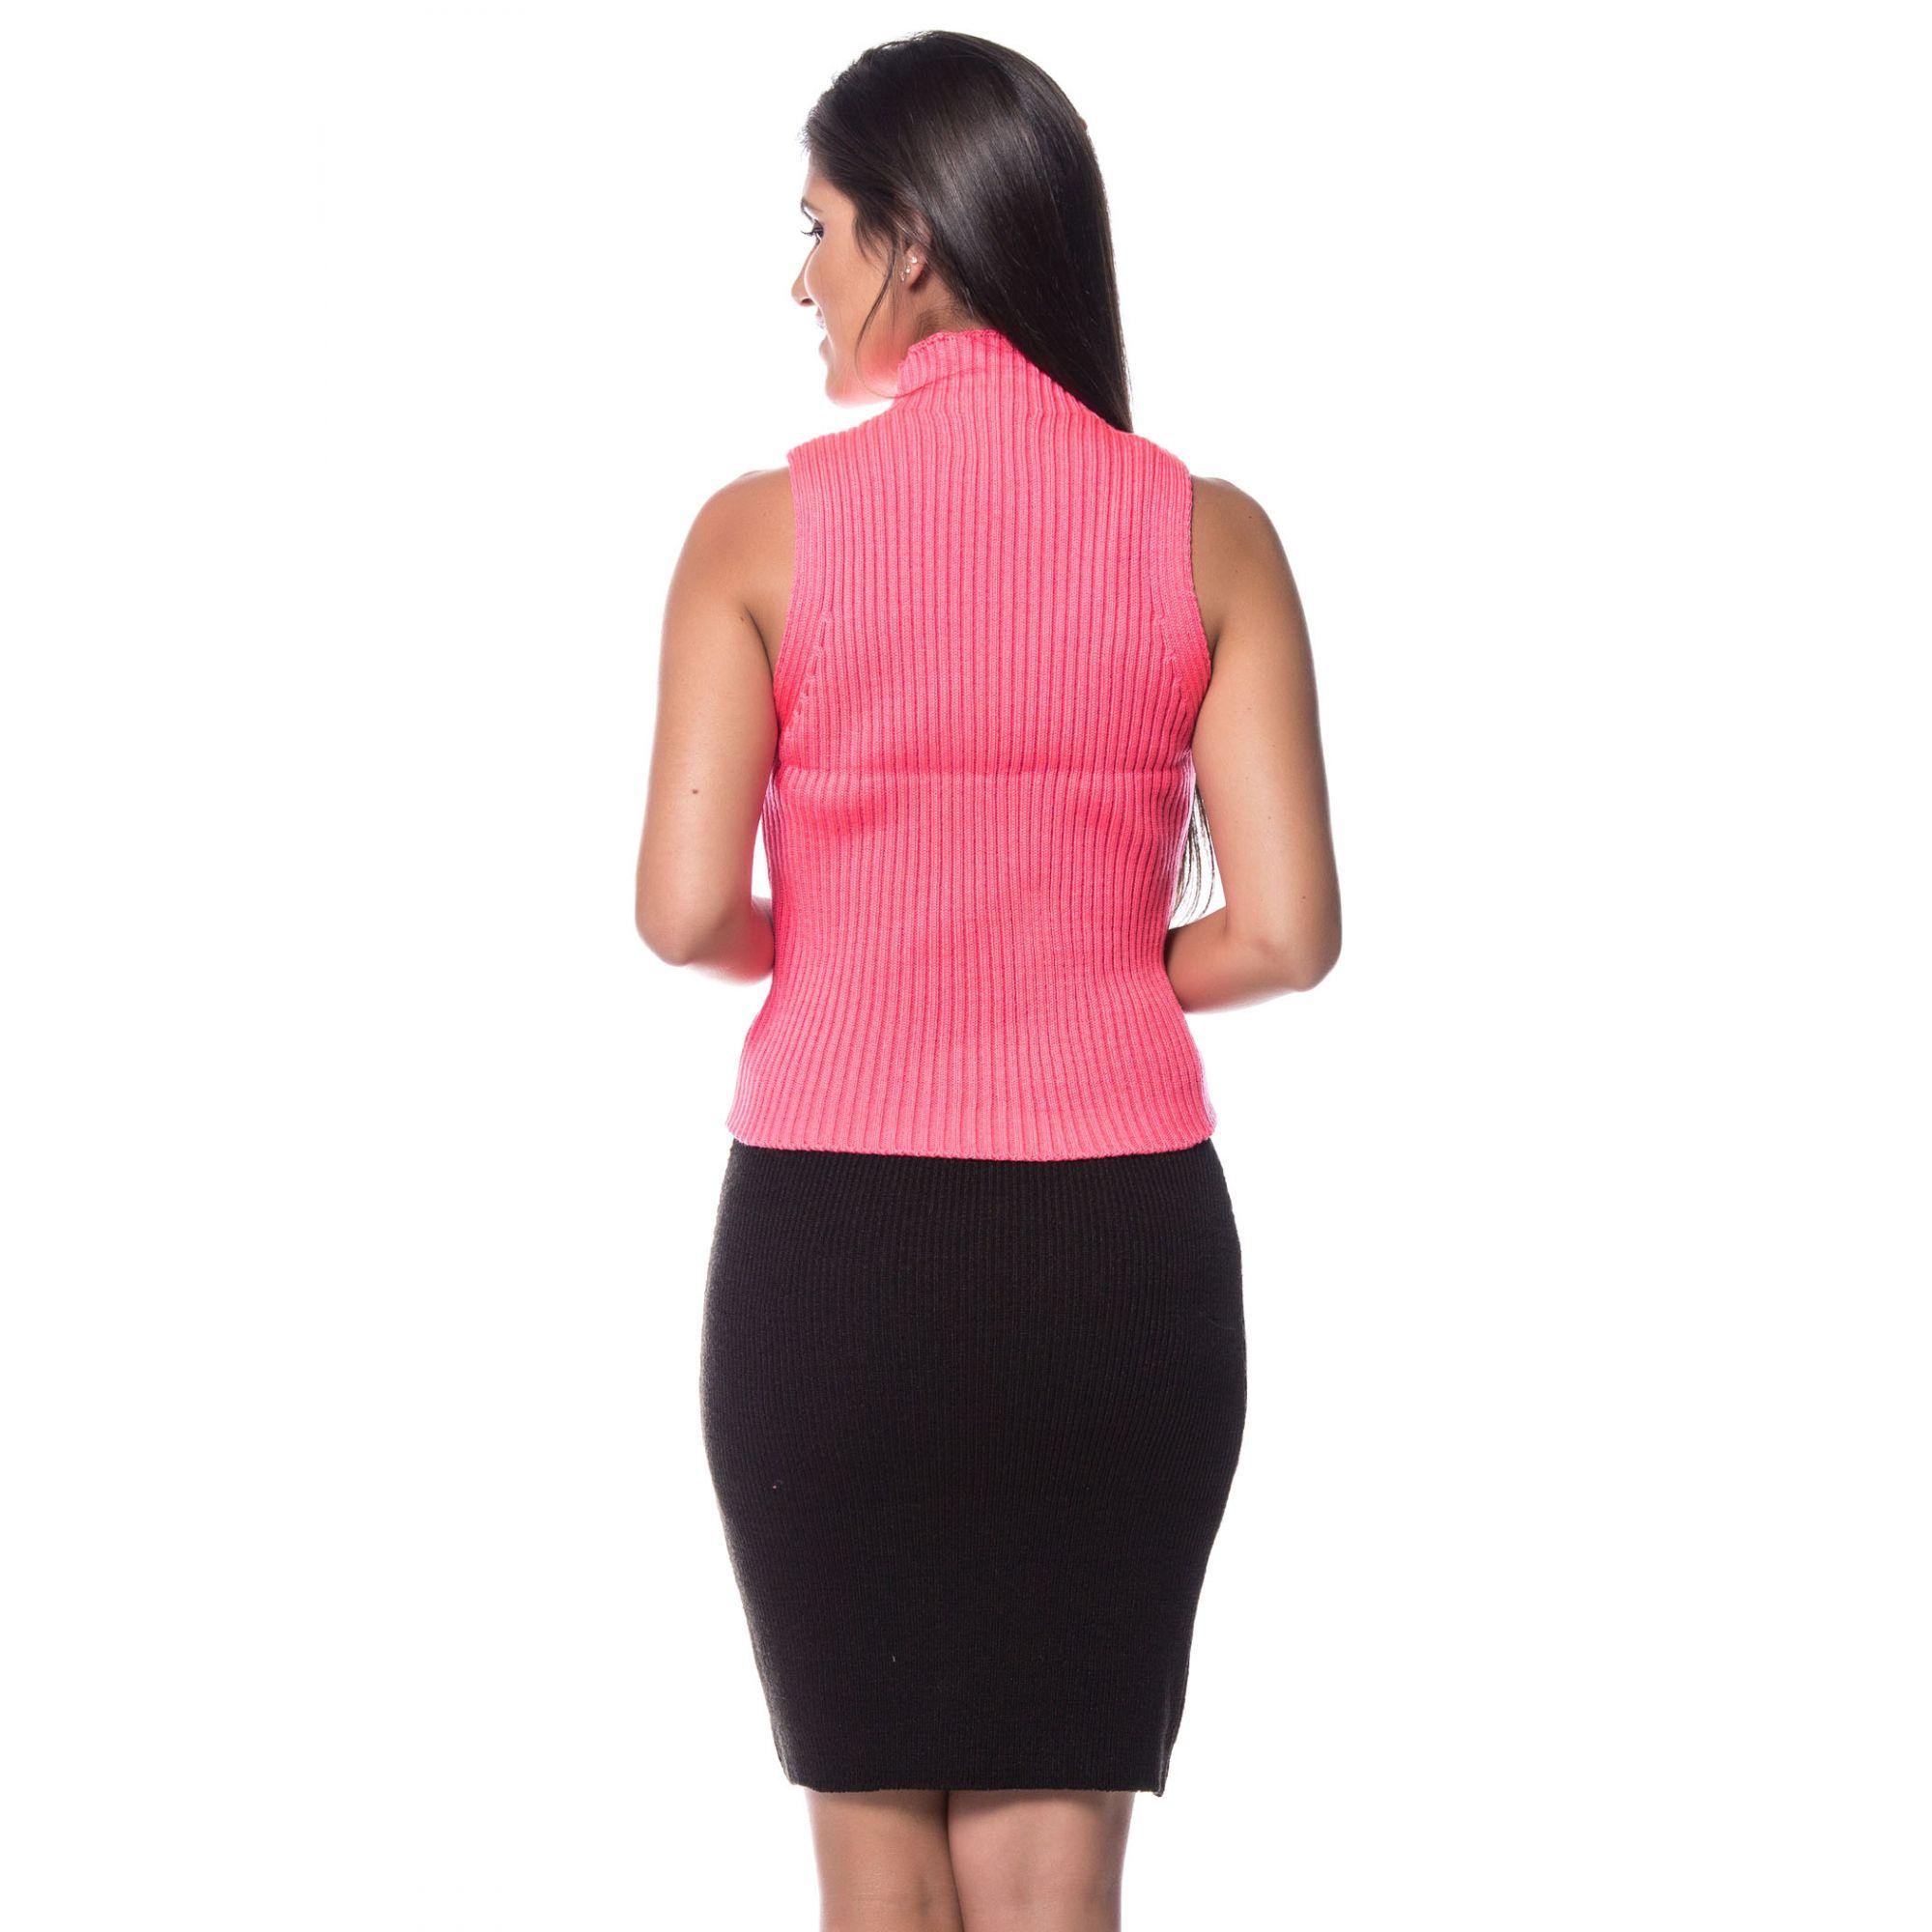 Blusa Regata Vera Tricot Gola Alta Feminino Pink